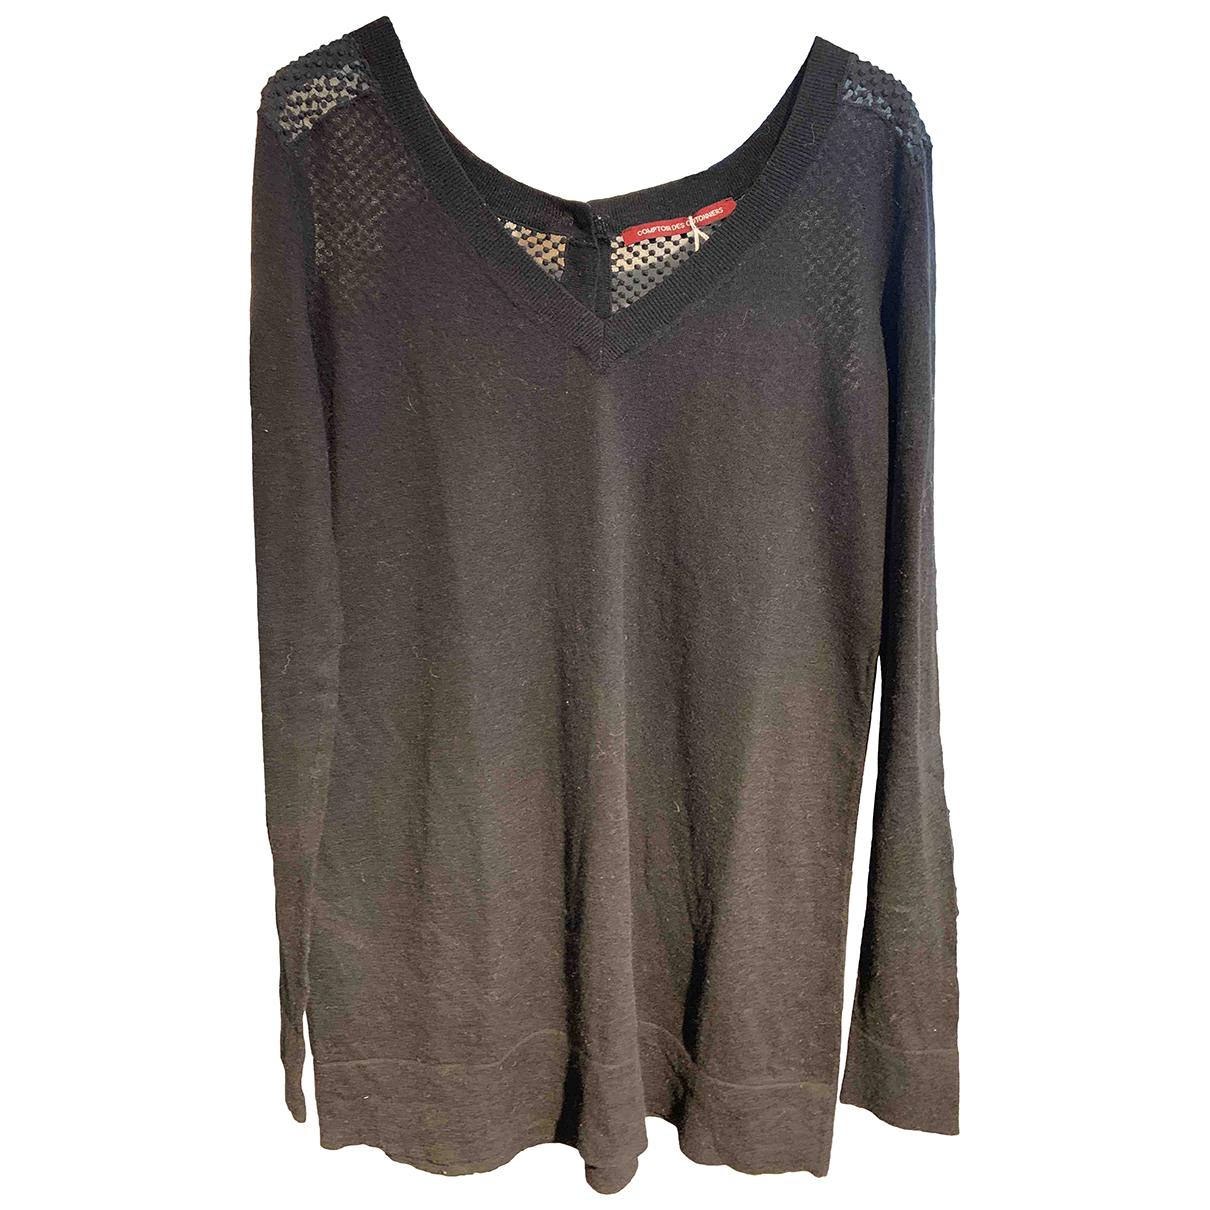 Comptoir Des Cotonniers N Black Wool Knitwear for Women S International